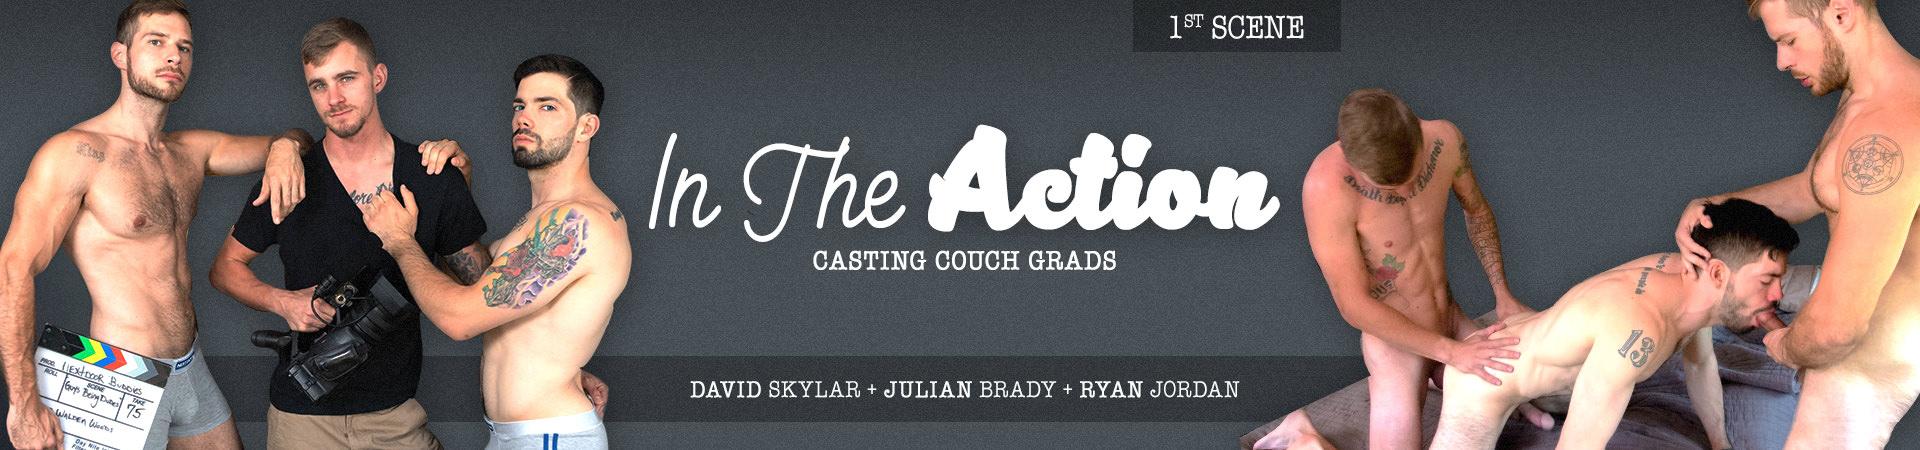 In the Action Featuring David Skyler, Julian Brady, and Ryan Jordan